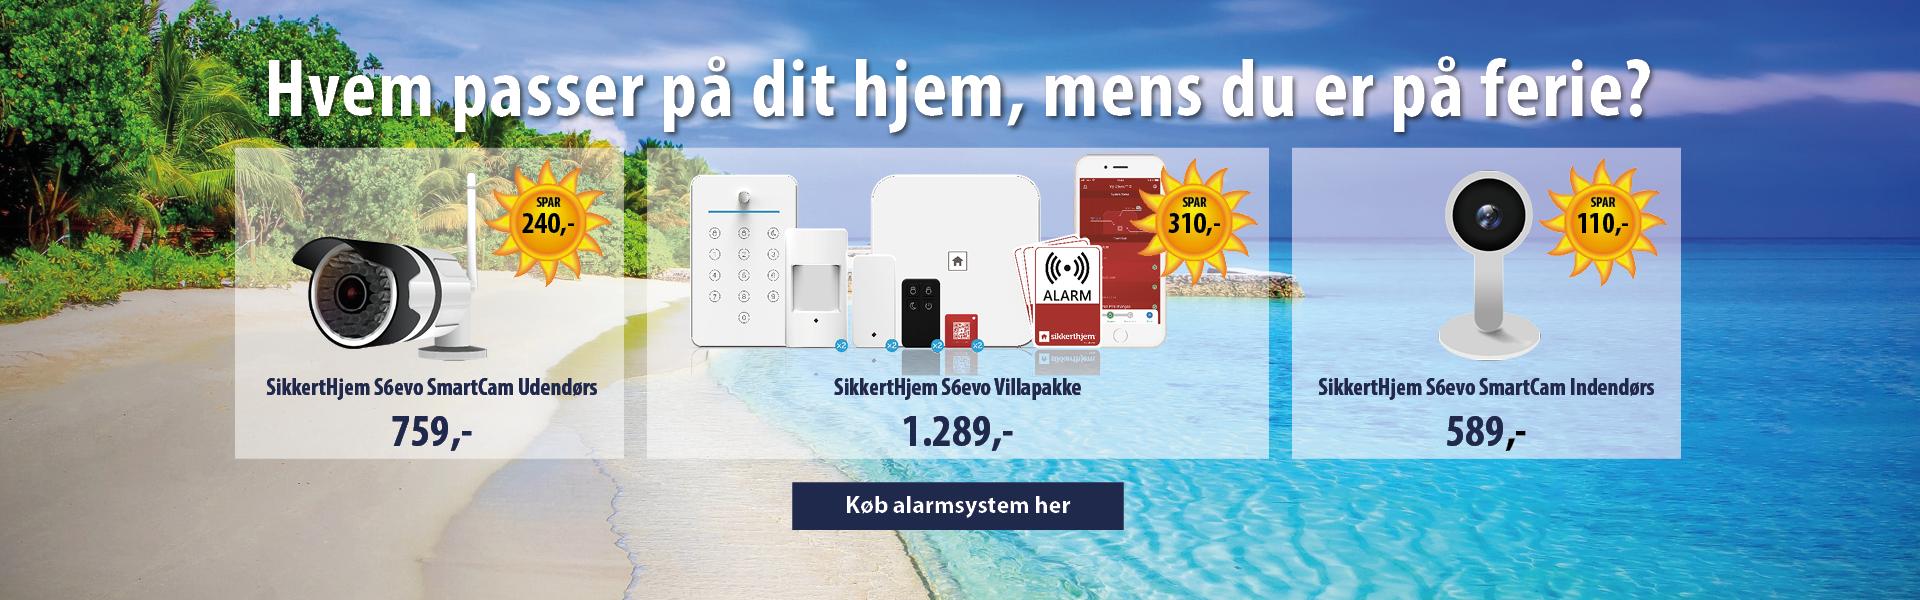 SikkertHjem_Alarmsystem_Netbyggemarked